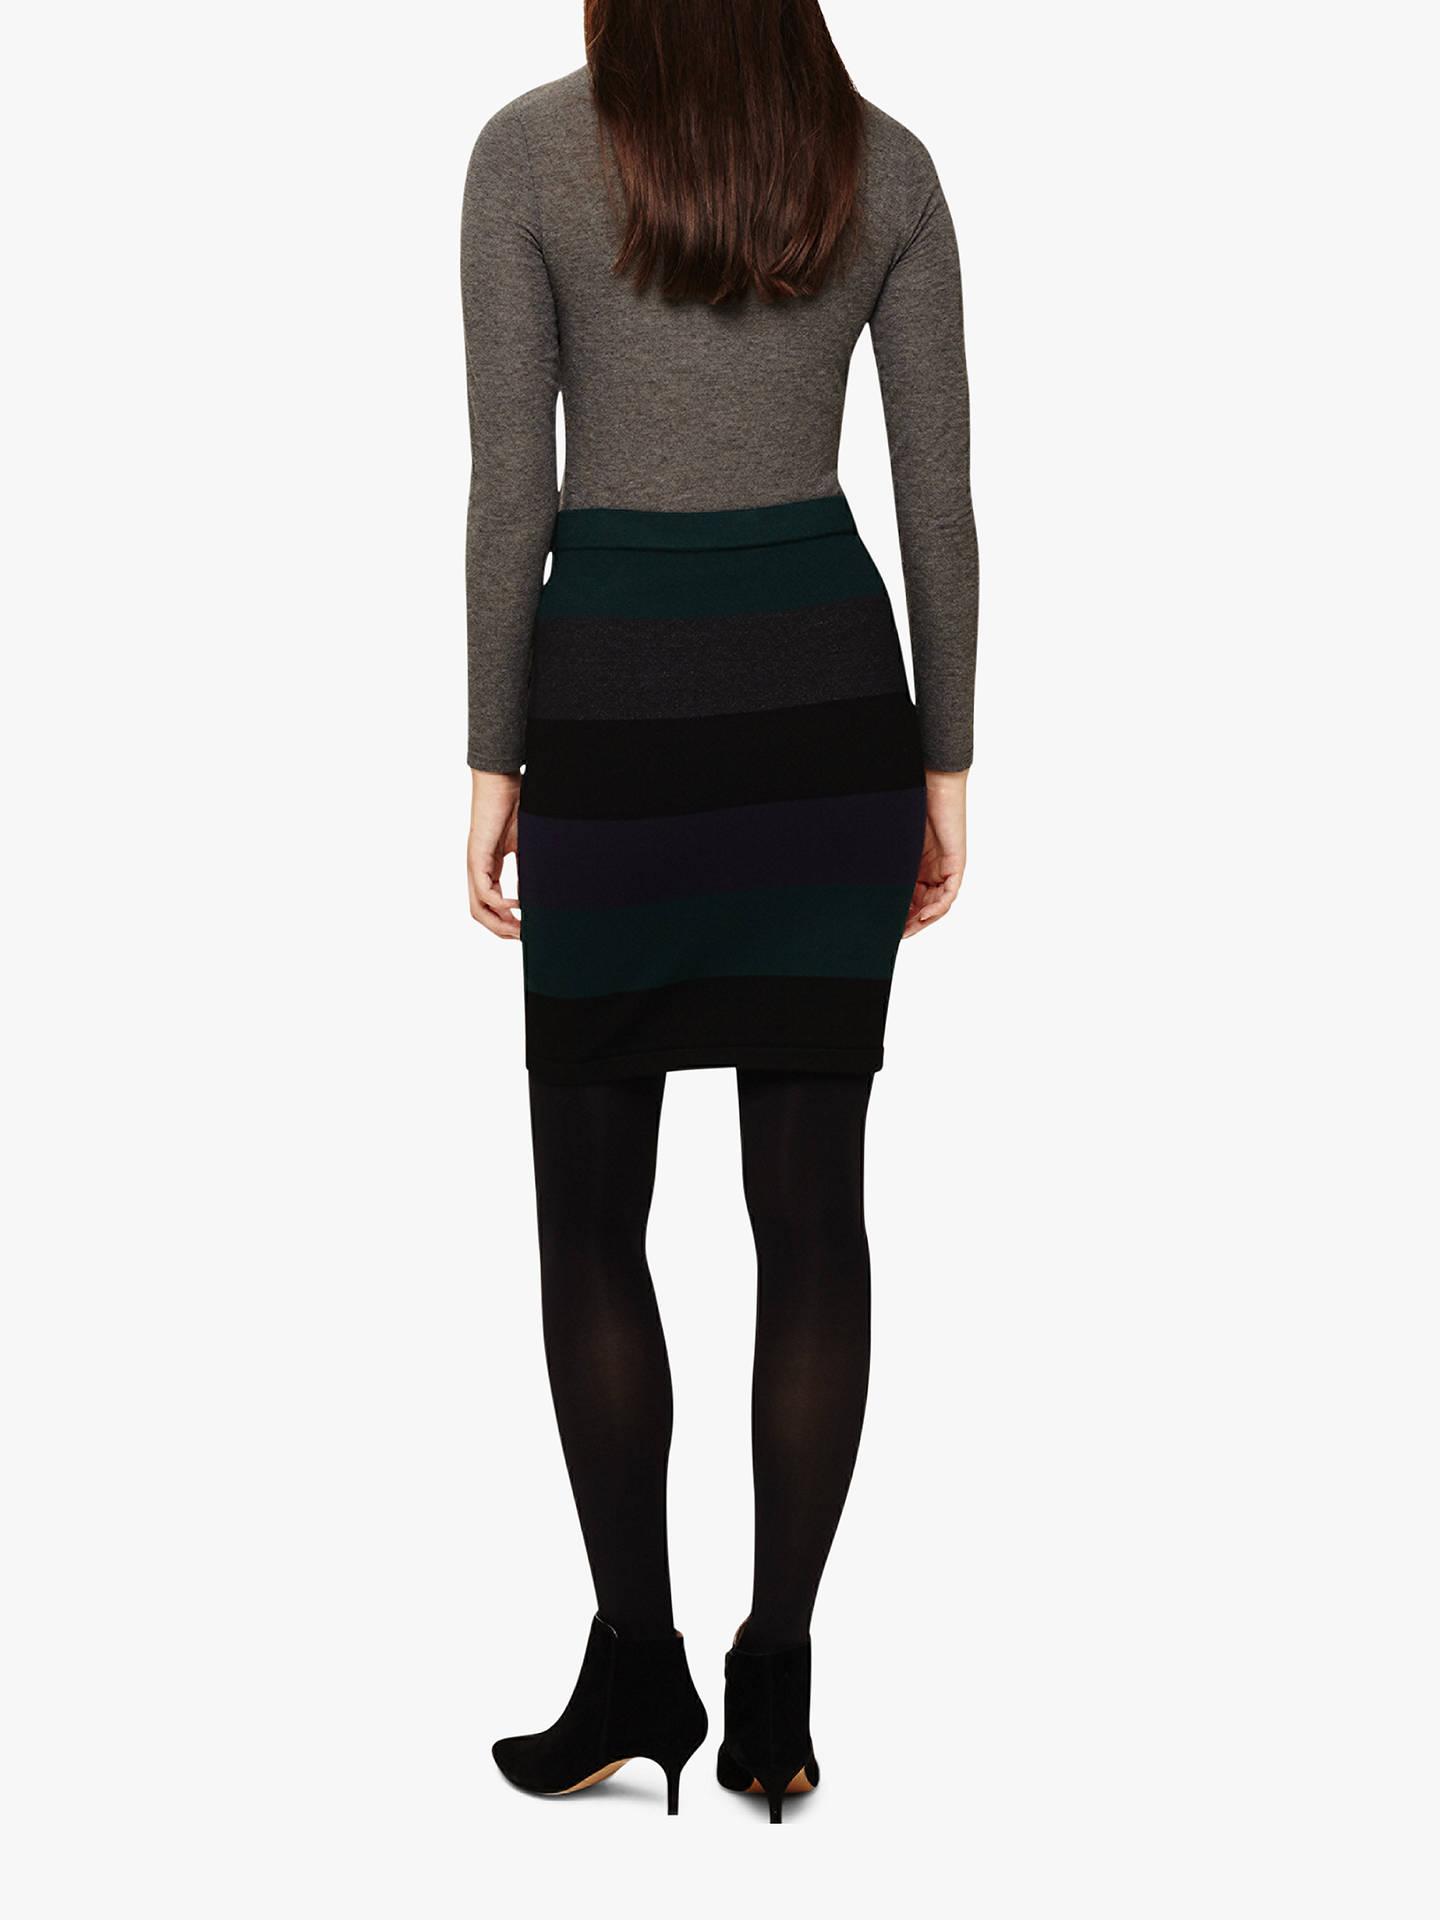 phase huit Abingdon crochet robe rencontres Charlotte NC